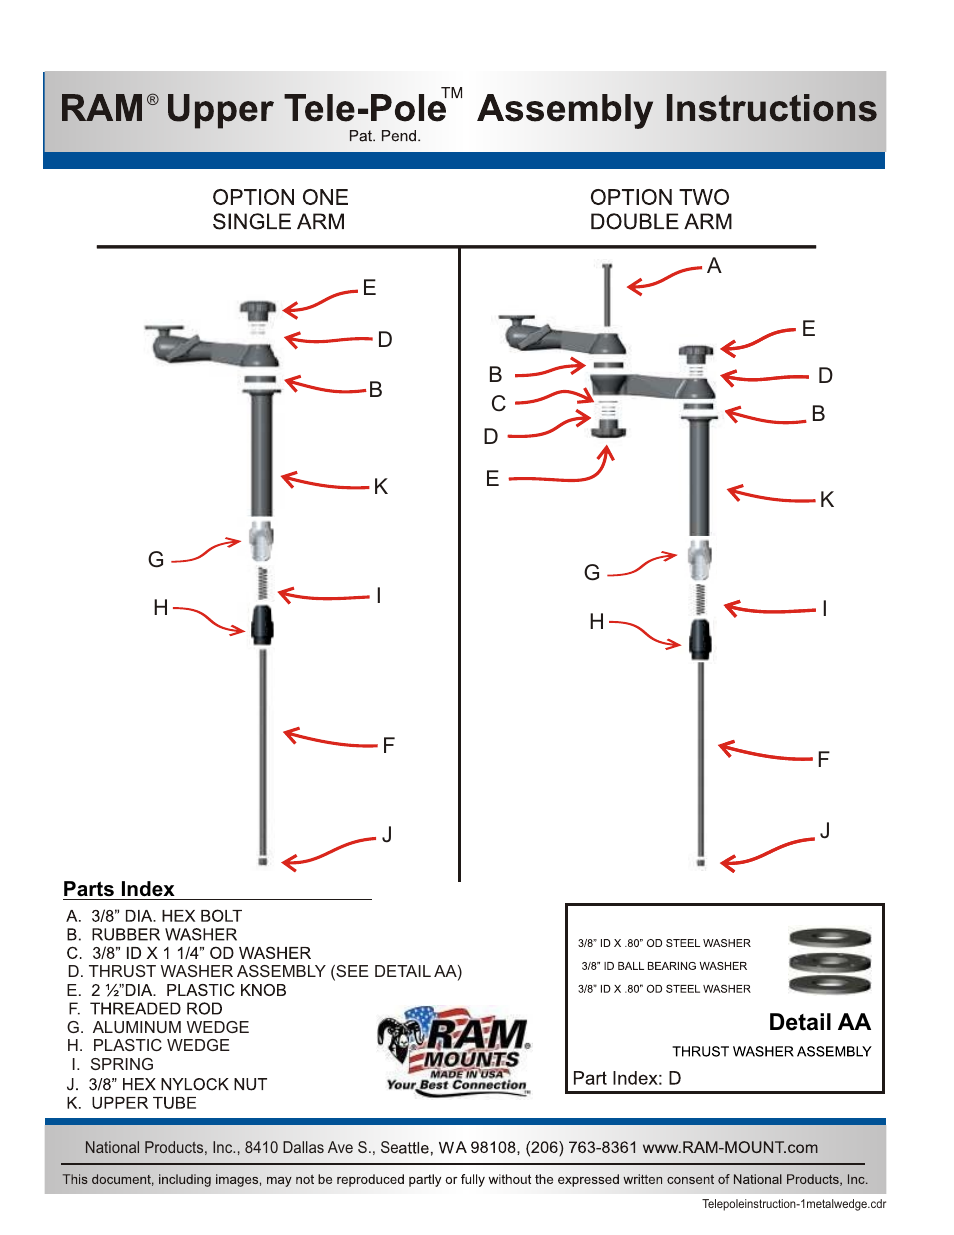 Ram Mount Tele Pole Height Adjustment User Manual 1 Page John Deere 8410 Wiring Diagram